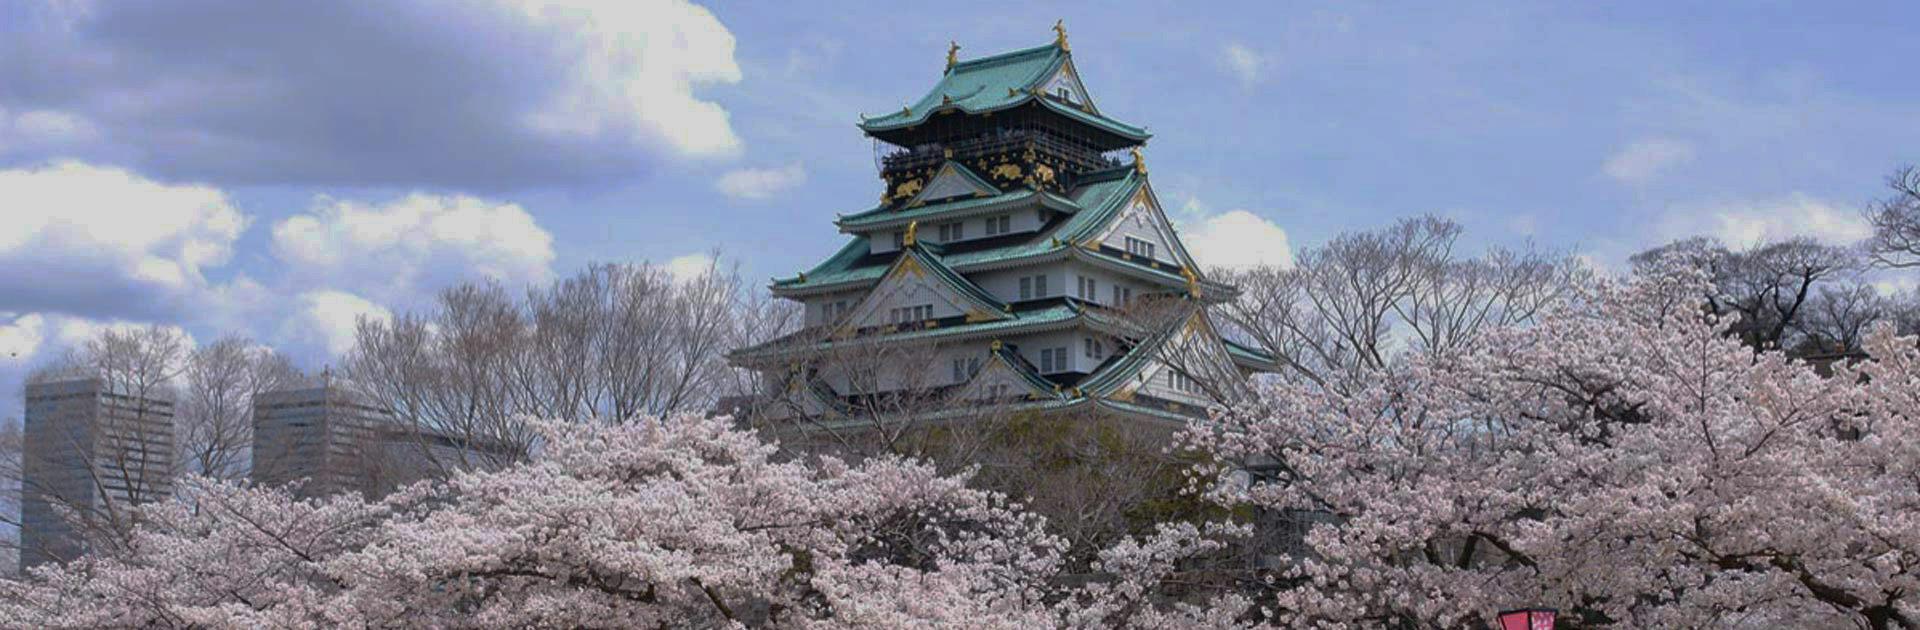 Semana Santa Konnichiwa Japón 8 días 4